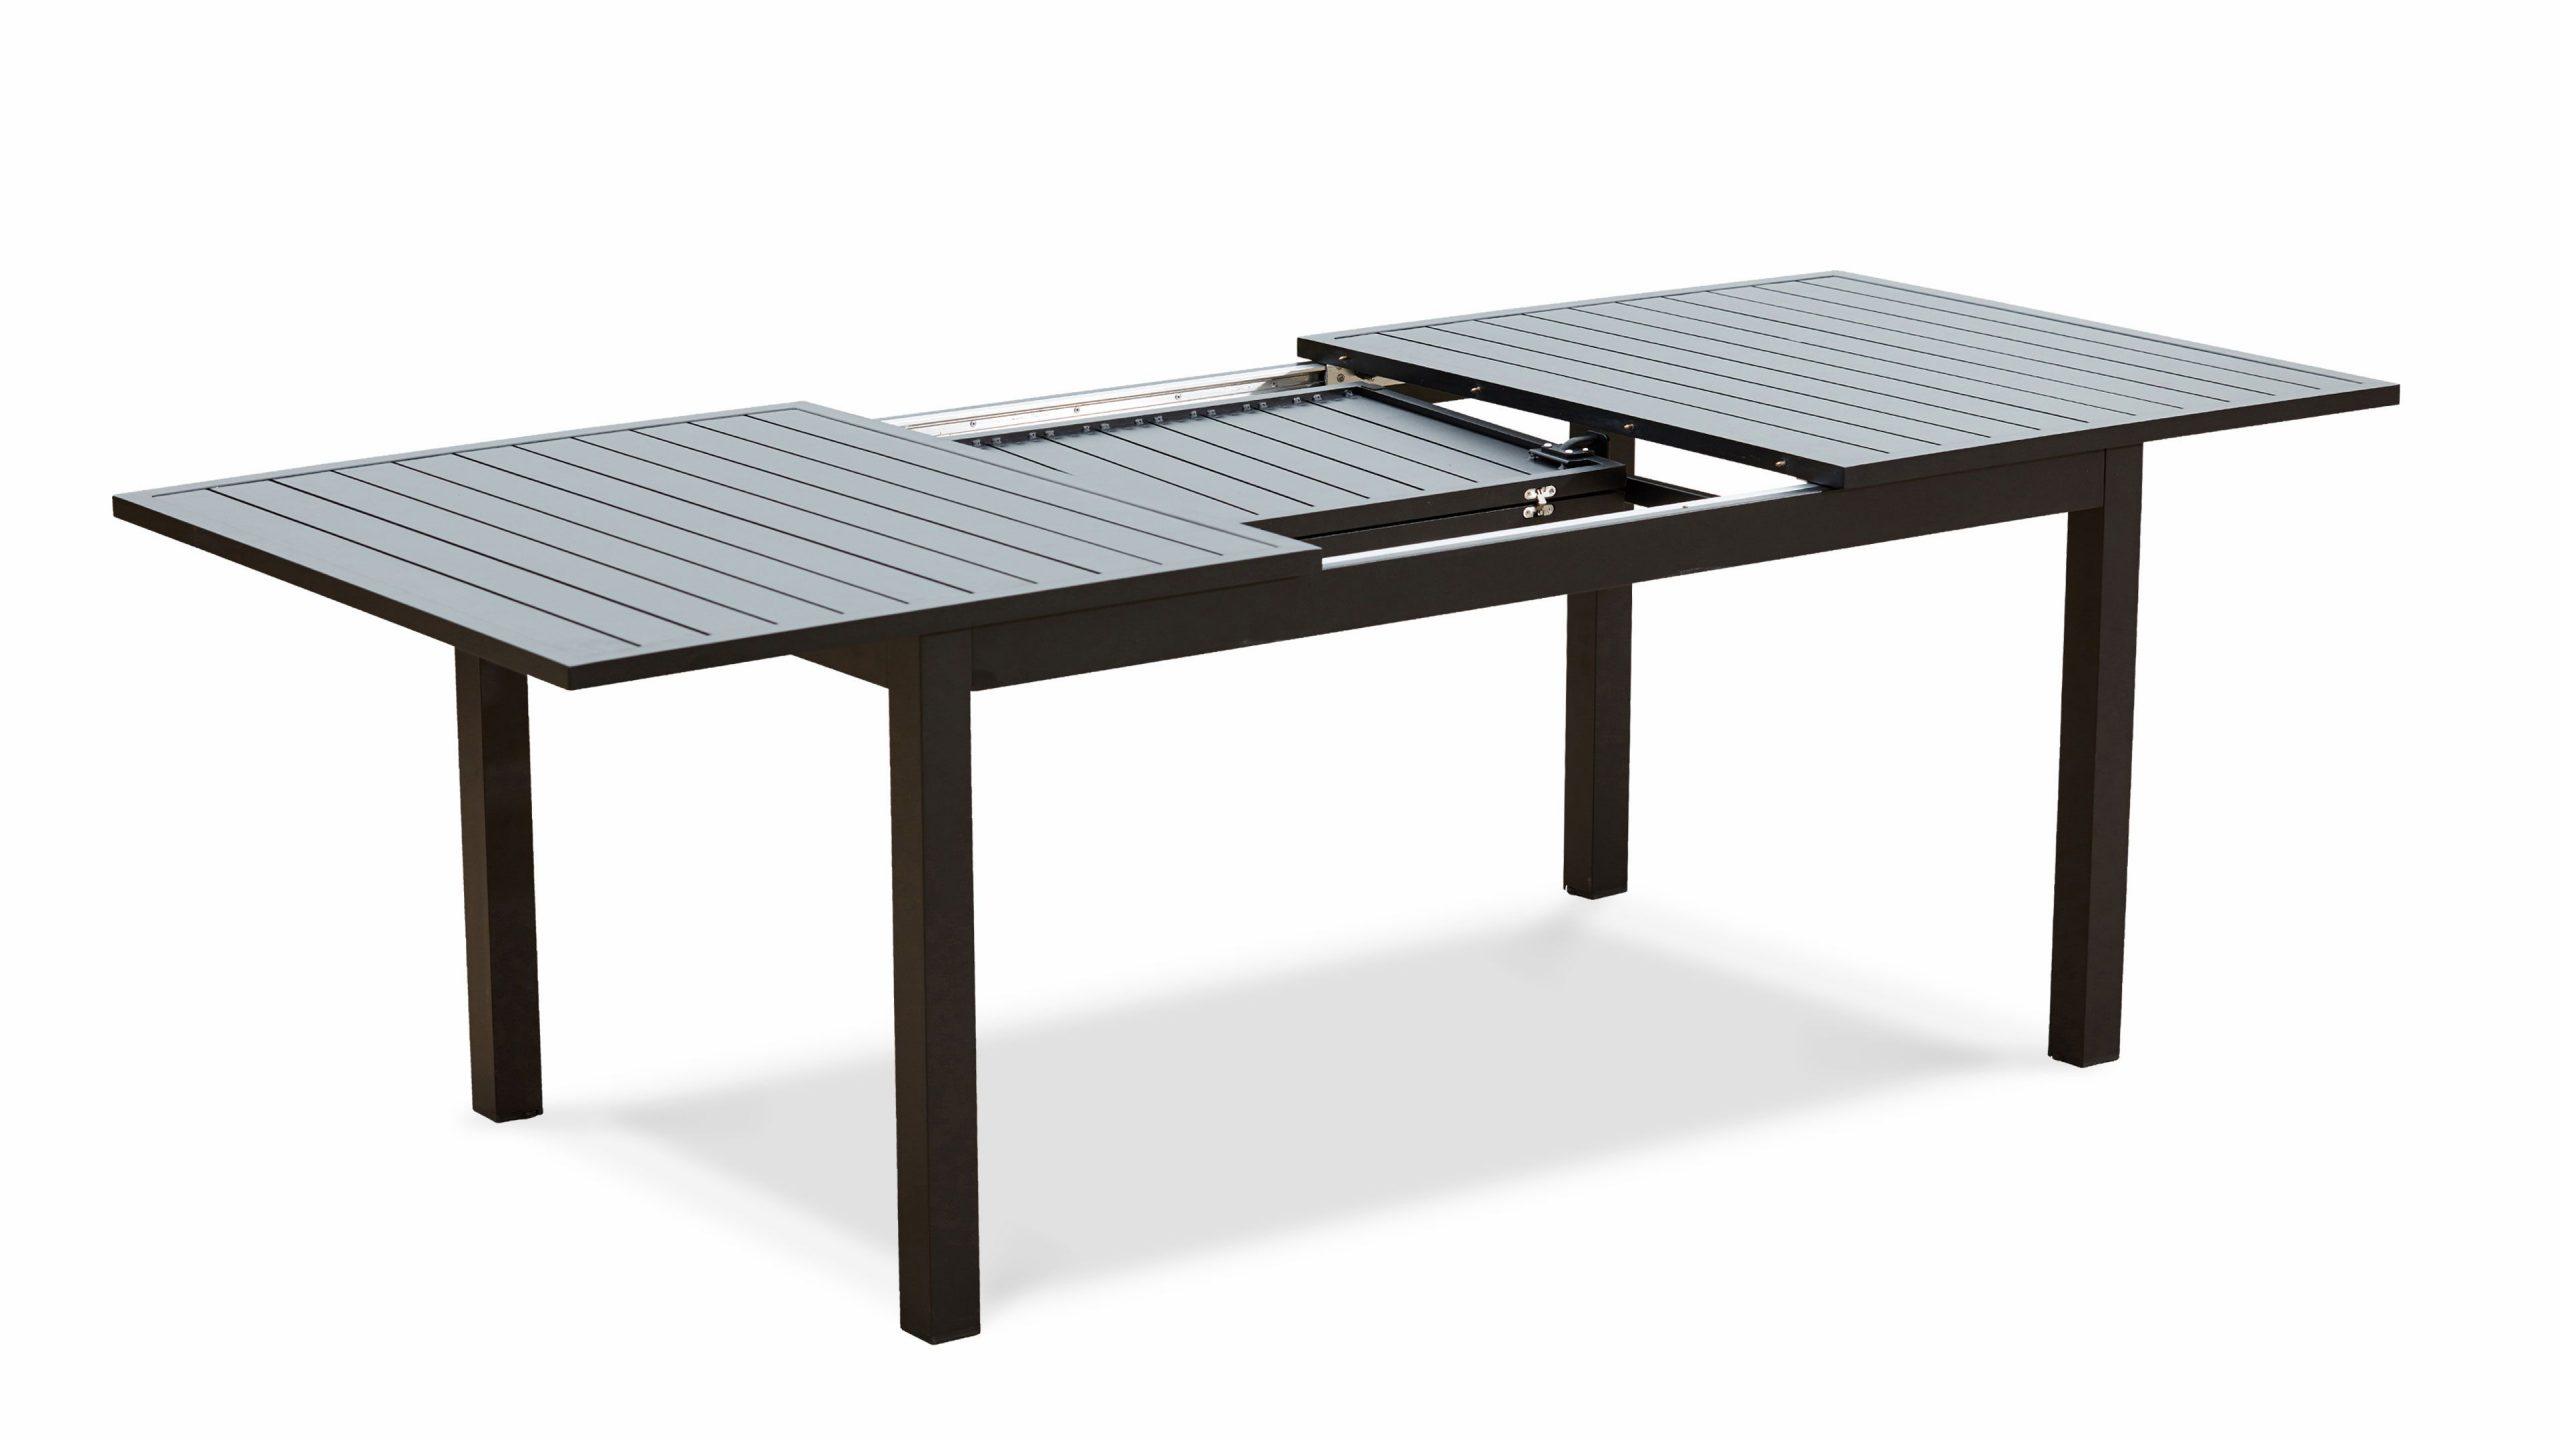 Table Jardin Extensible Rallonge 174/238 Cm Aluminium serapportantà Tables De Jardin Pas Cher